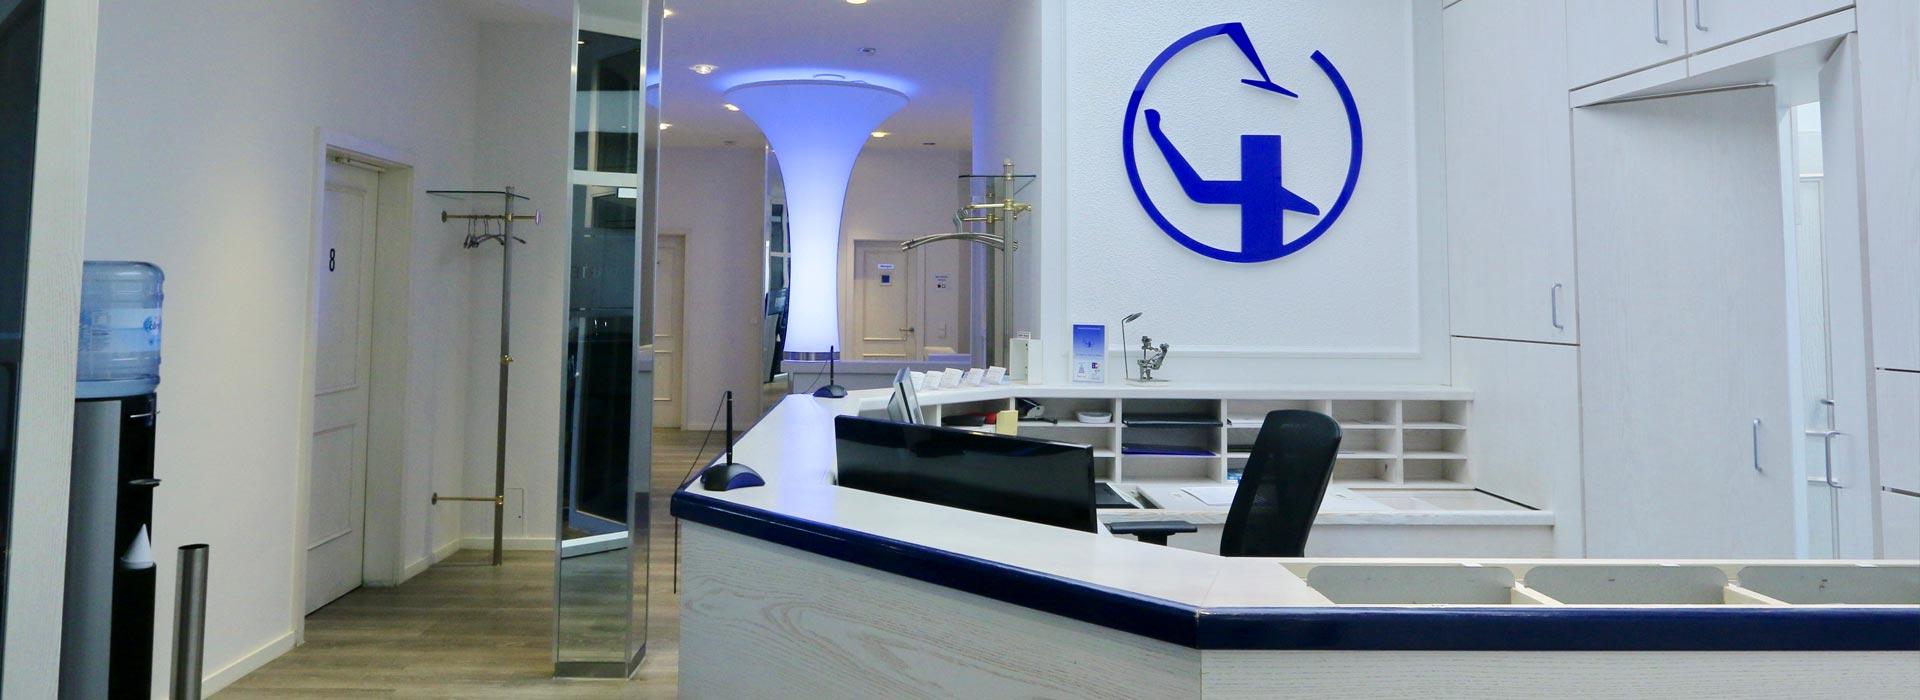 Empfang der Zahnarztpraxis in Münsing